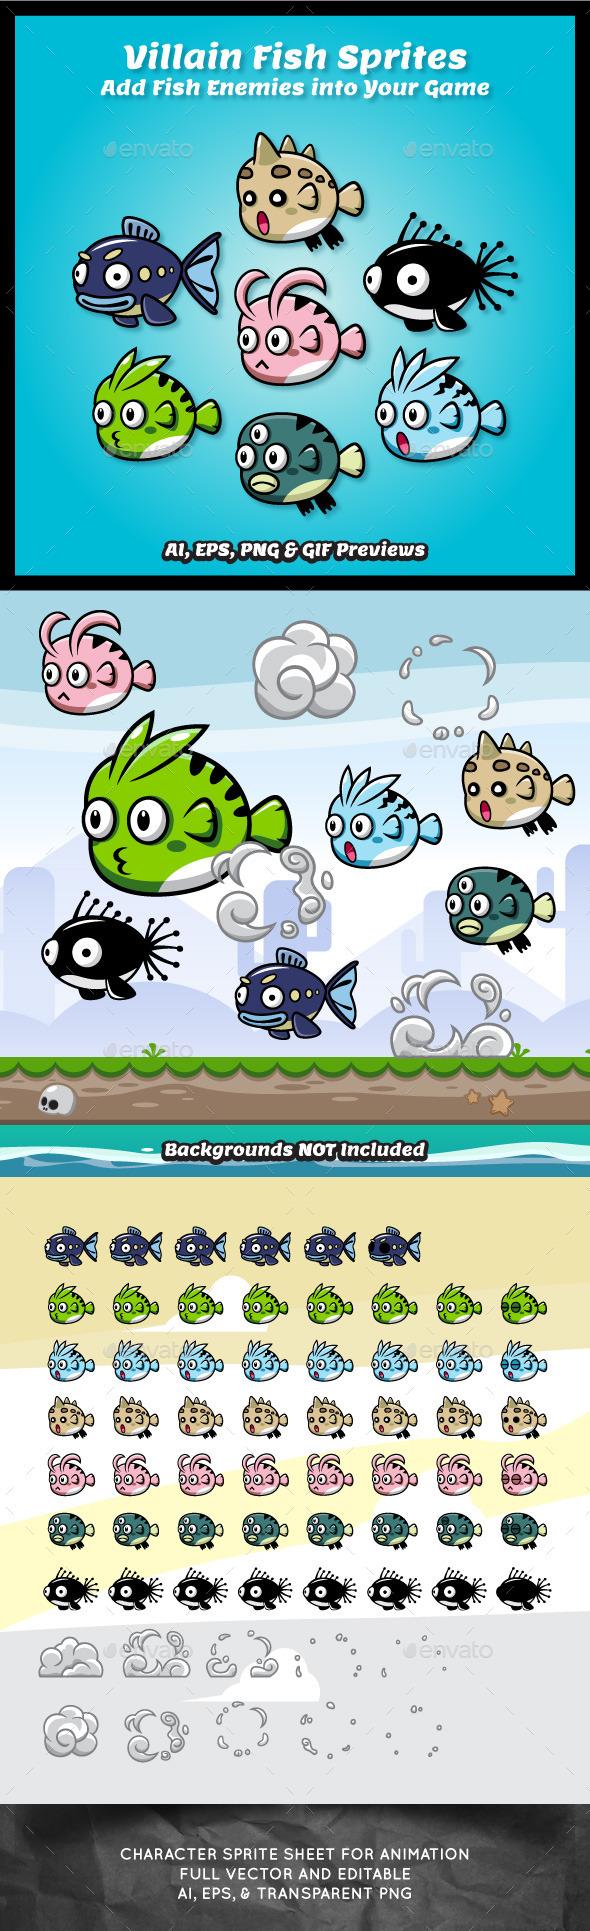 7 Villains Fish Sprite Sheets